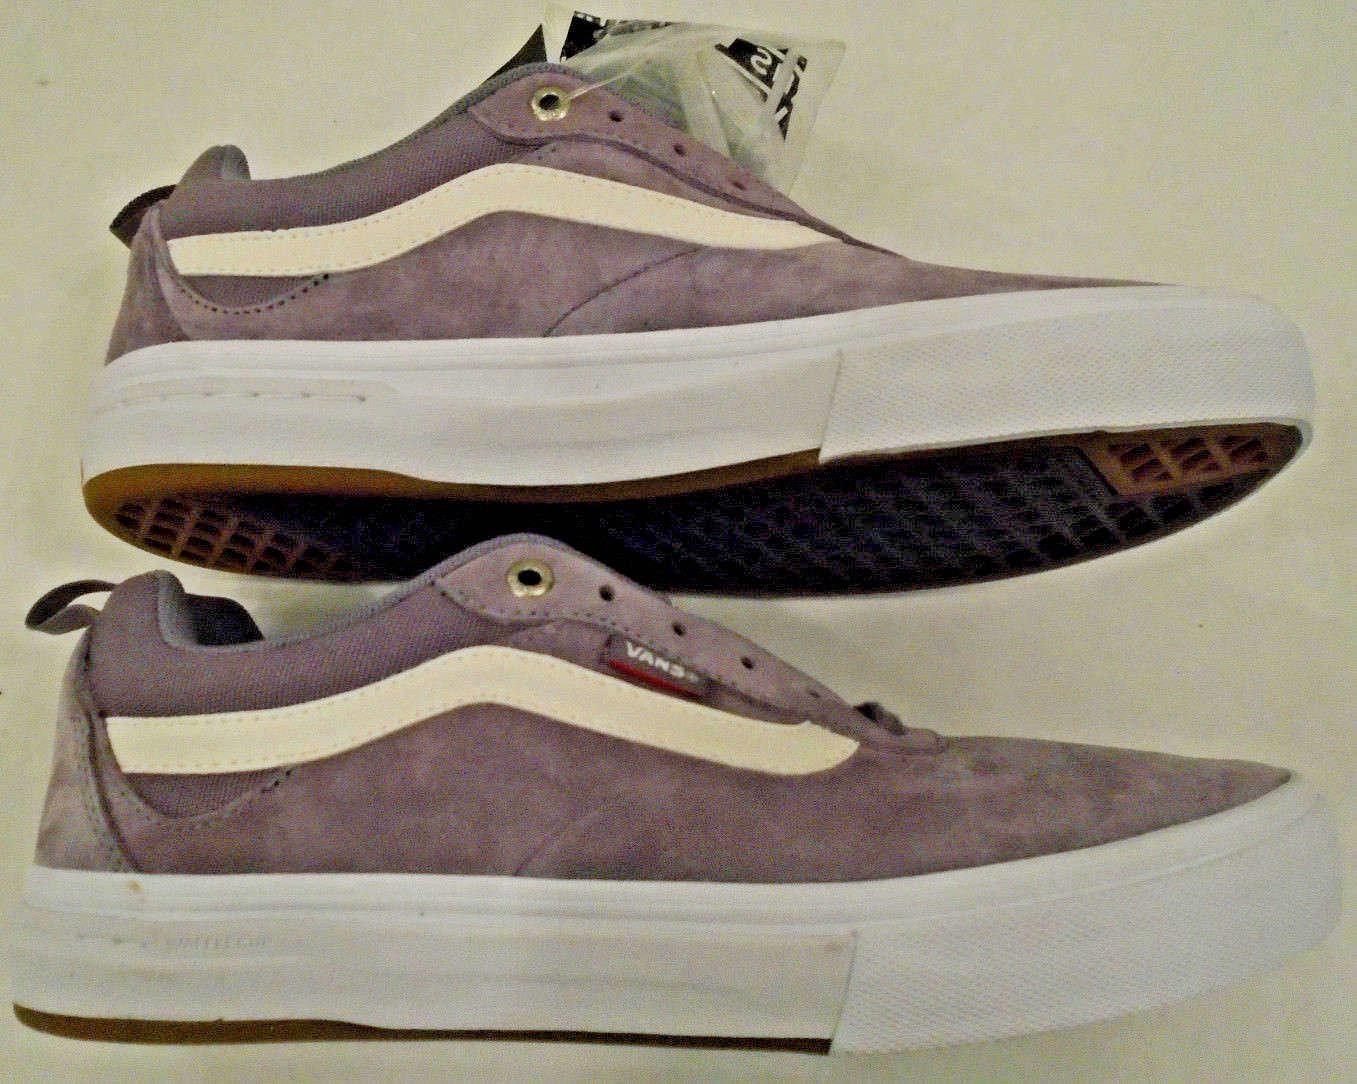 NEW Vans Uomo 8.5 Kyle Walker Pro Suede Skateboarding Shoes Light Fuchsia 721454